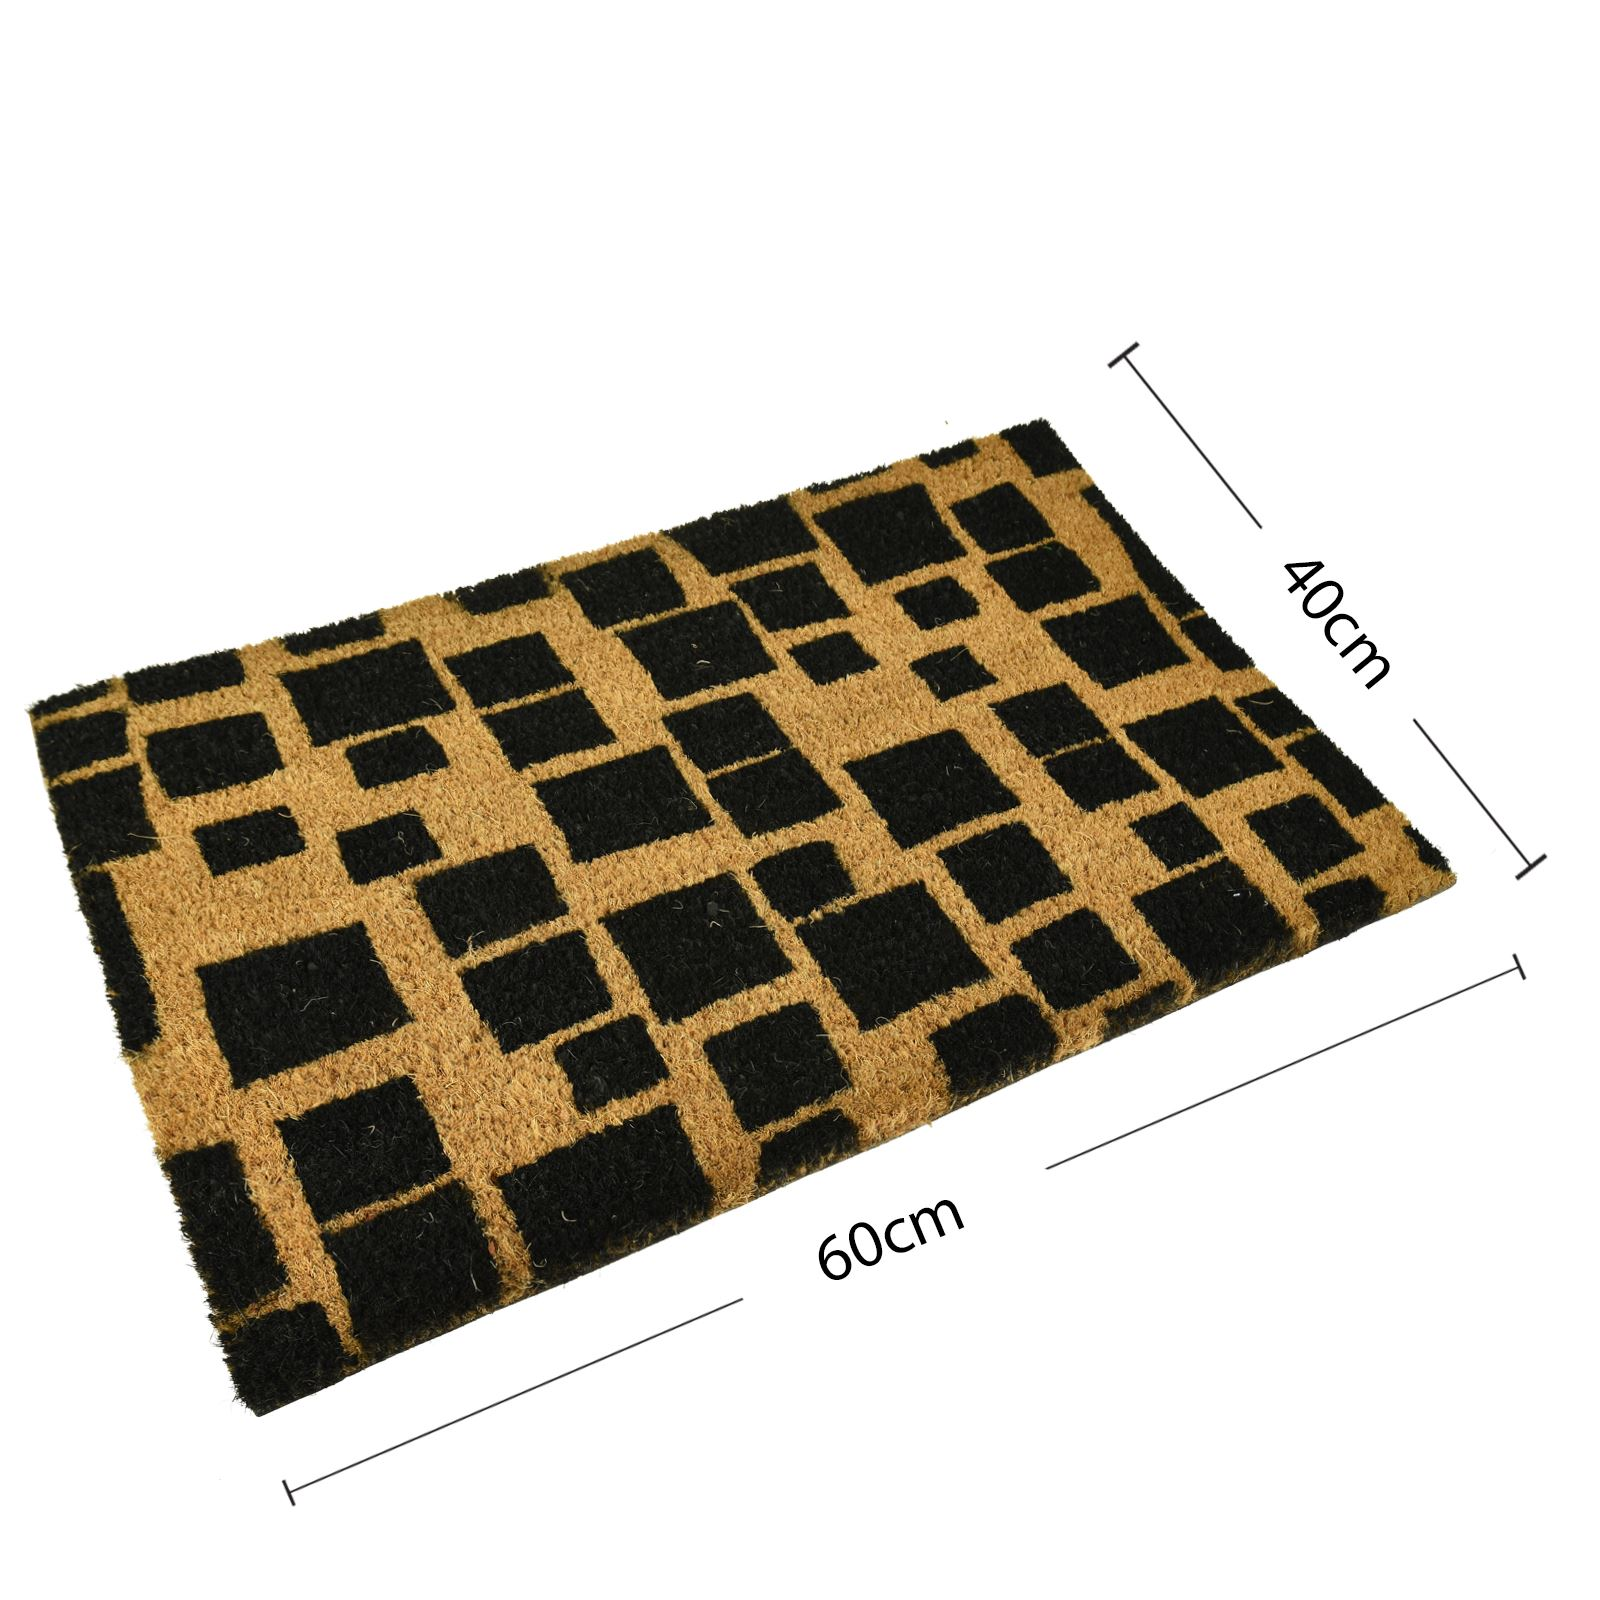 Plain-Non-Slip-Door-Mat-Tough-Natural-Coir-PVC-Back-Welcome-Doormat-40-x-60cm miniatura 21